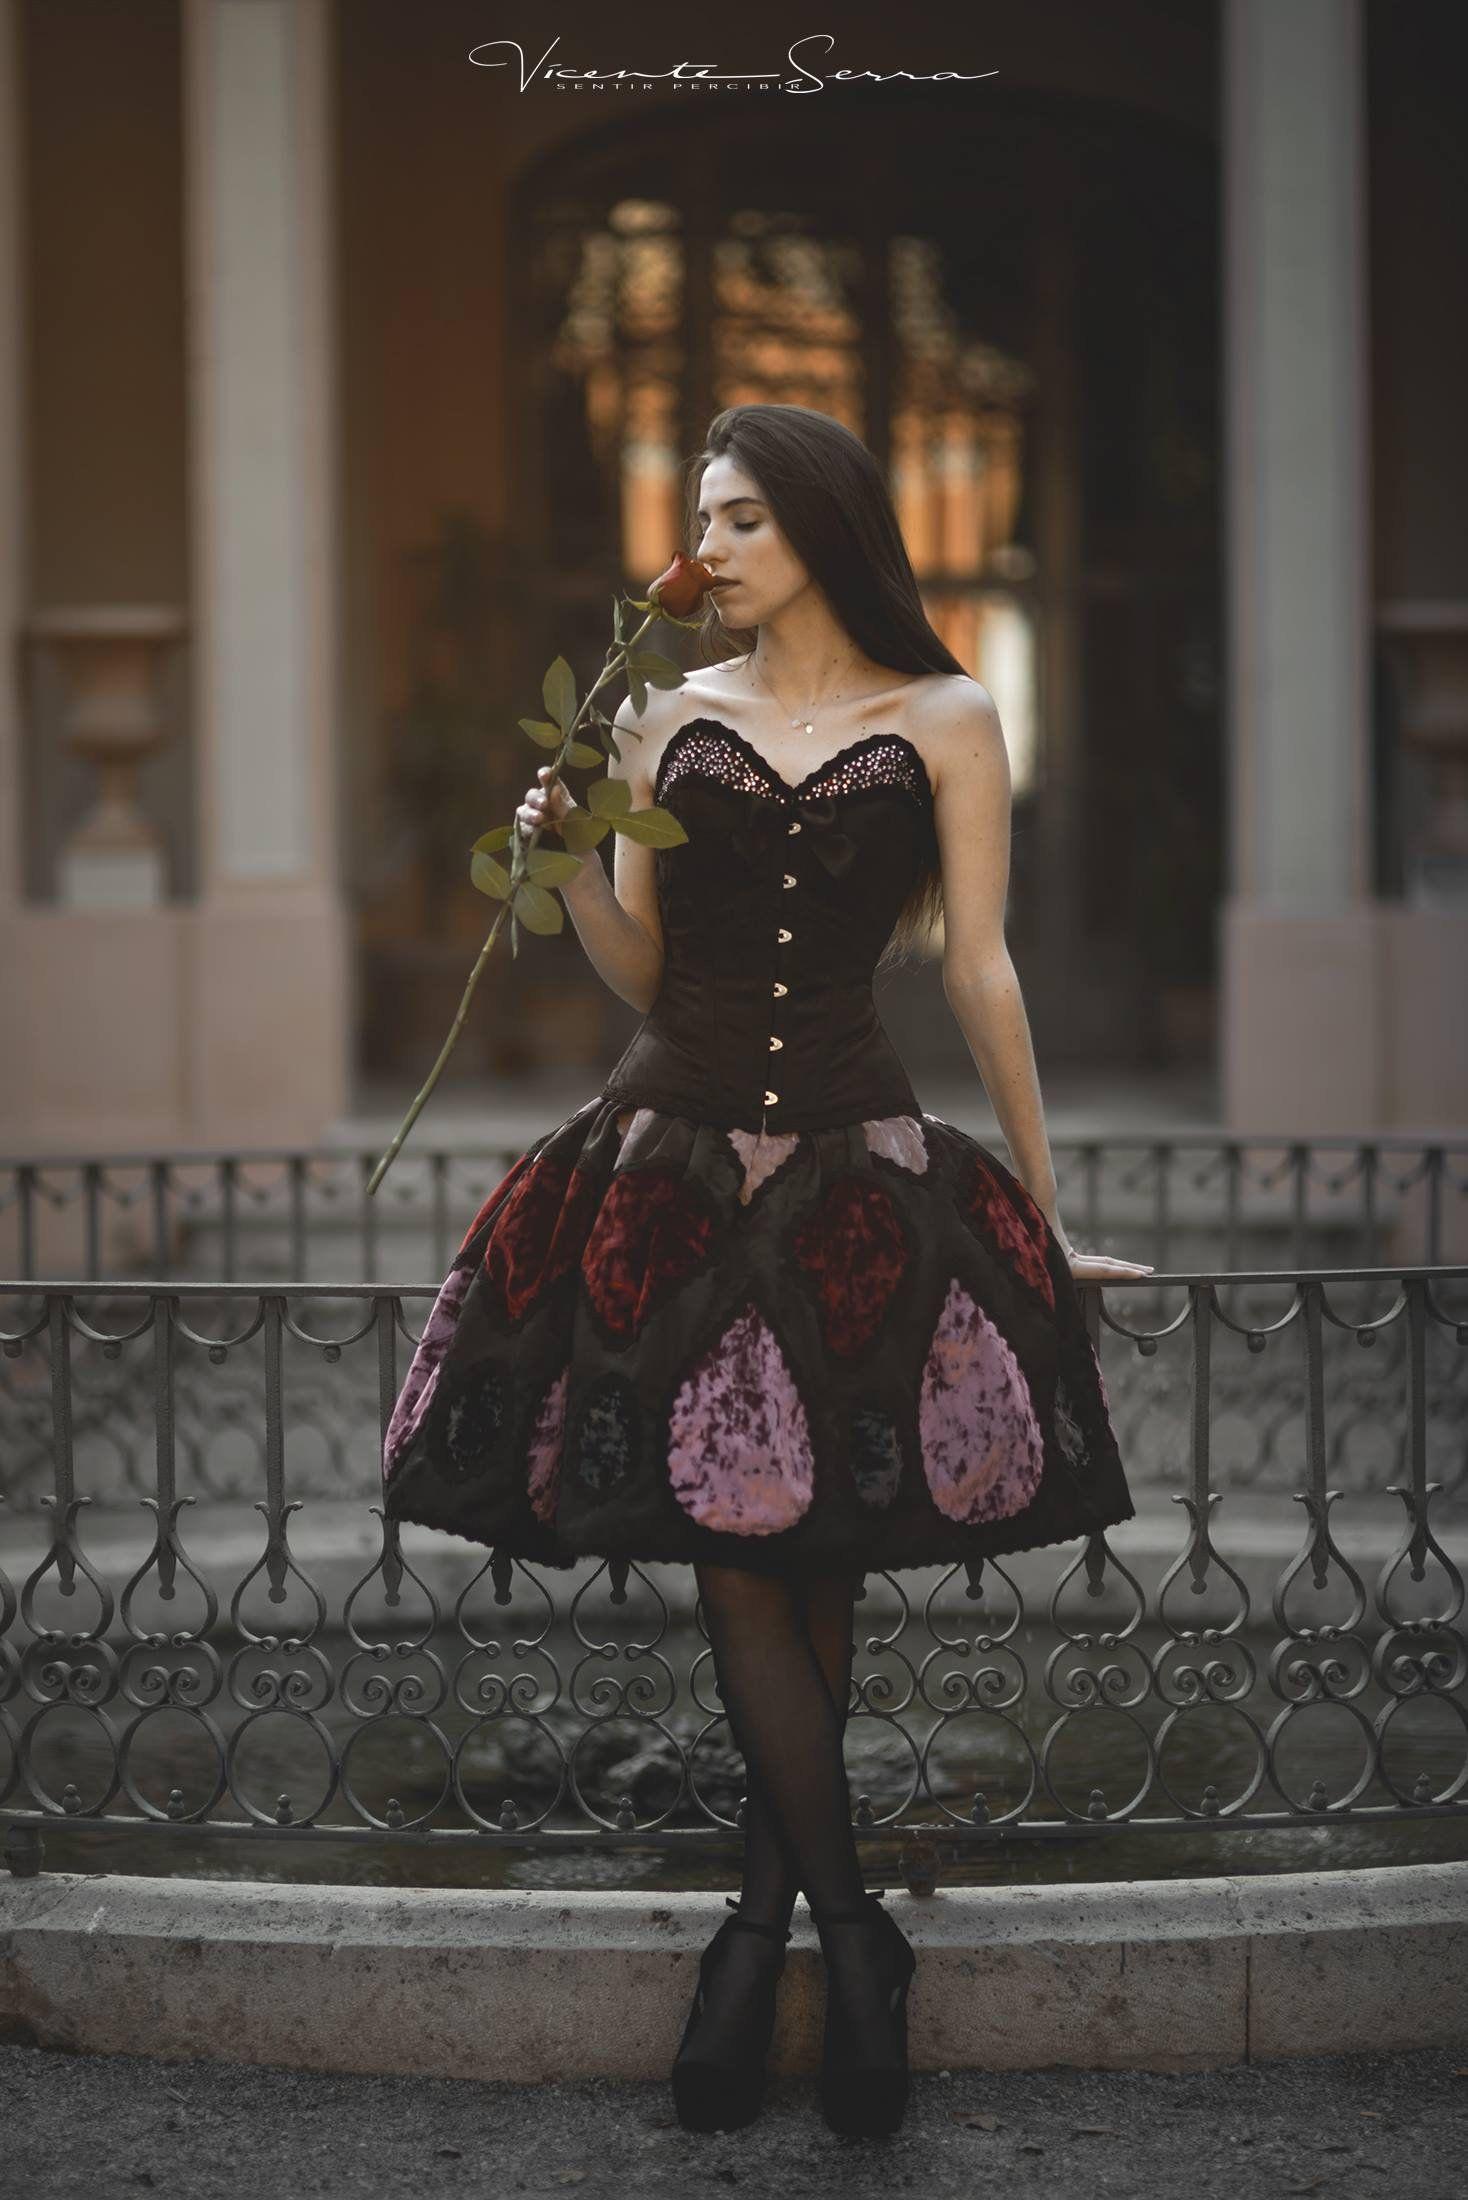 Haute couture gothic fantasy dress fairy princess wedding dress